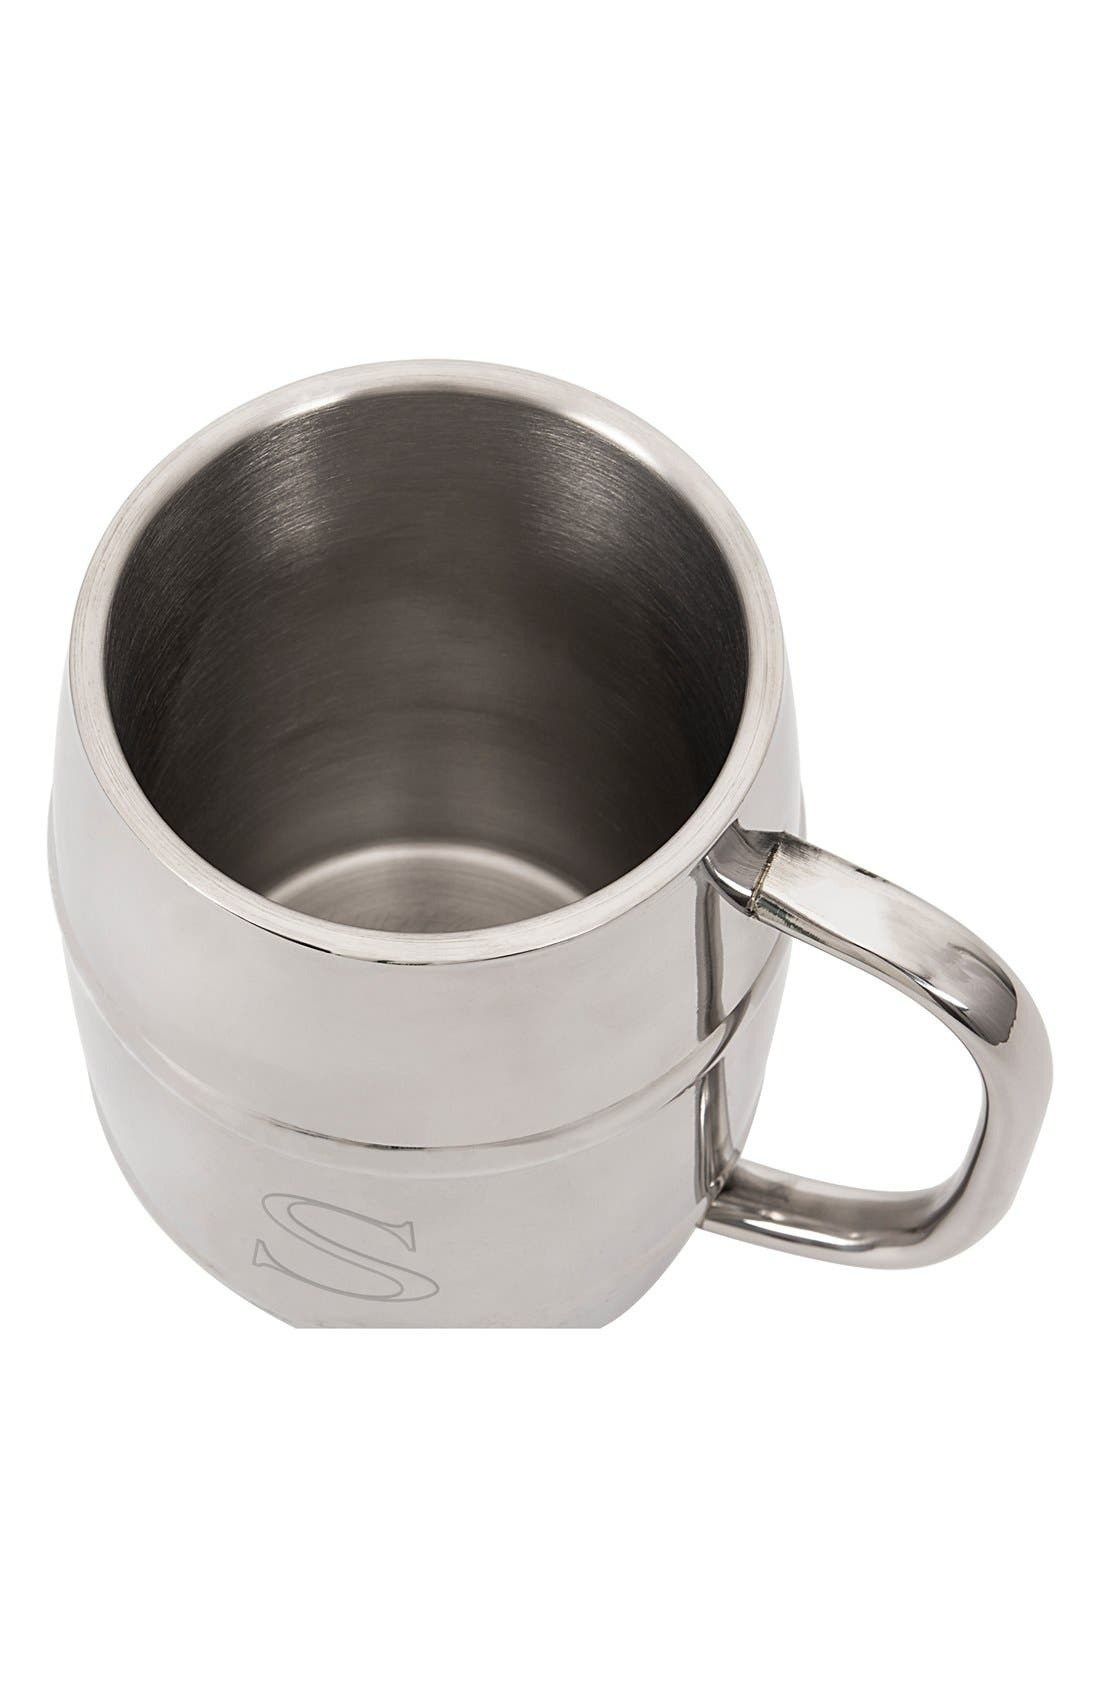 'XL Beer Keg' Monogram Mug,                             Alternate thumbnail 3, color,                             041